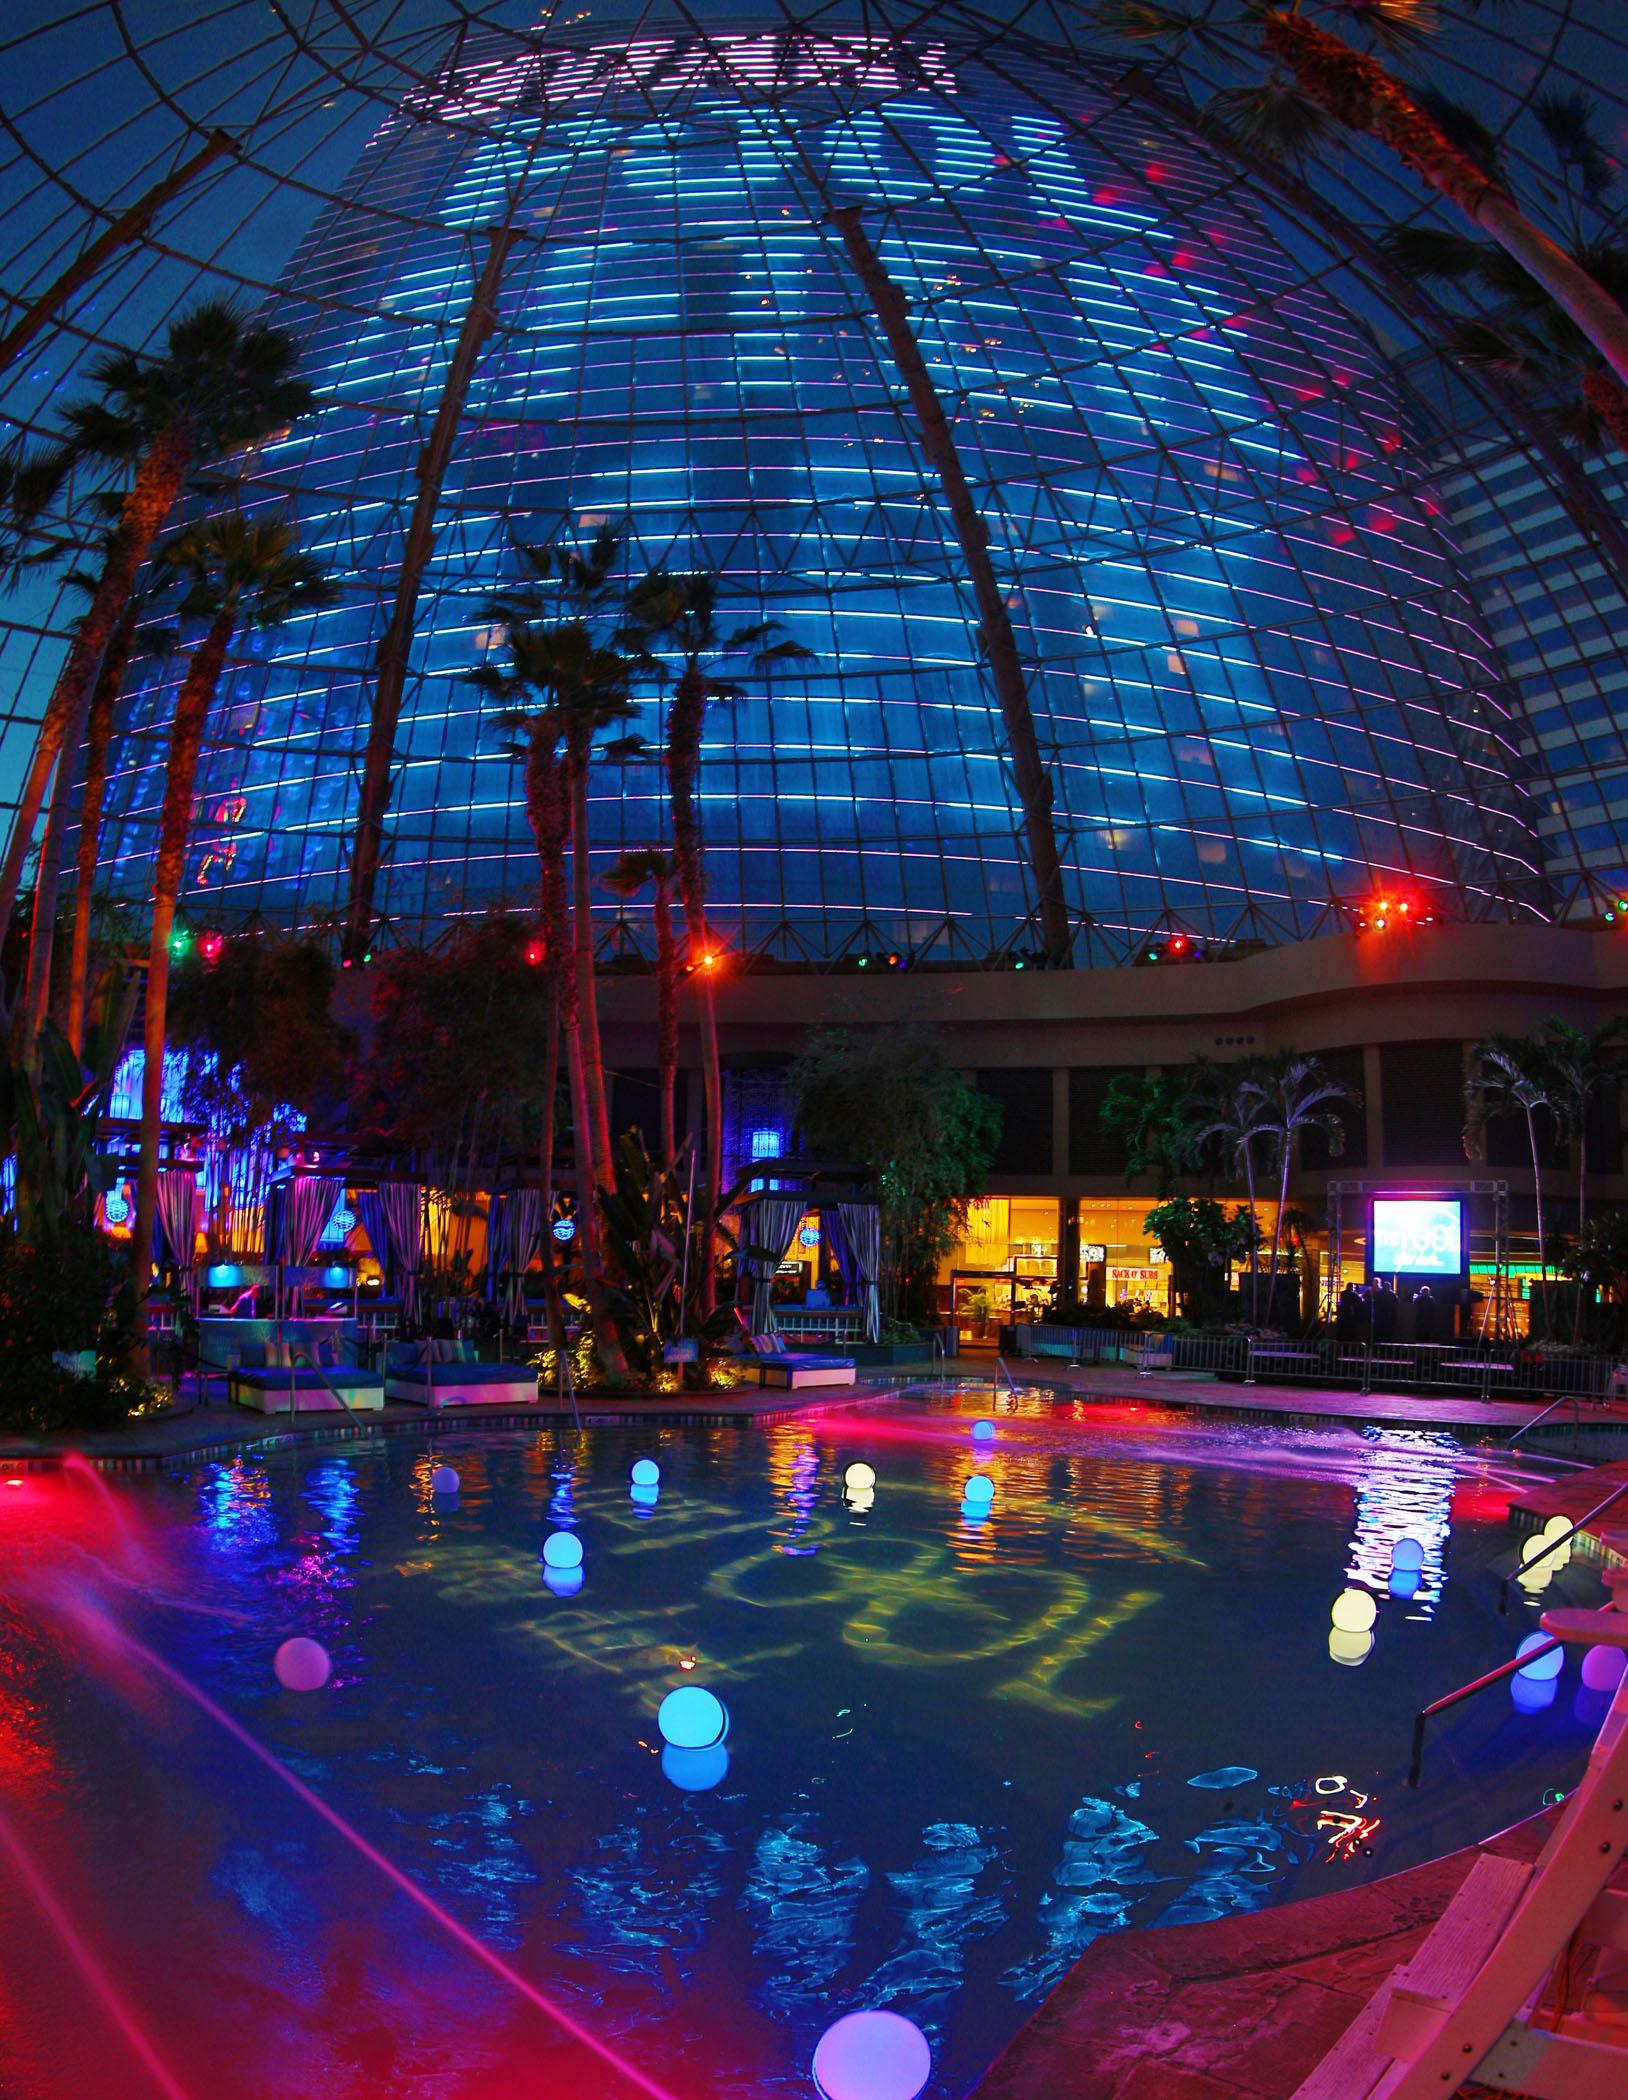 Harrahs Pool Party Pool After Dark Halloween Tickets 10/29/16